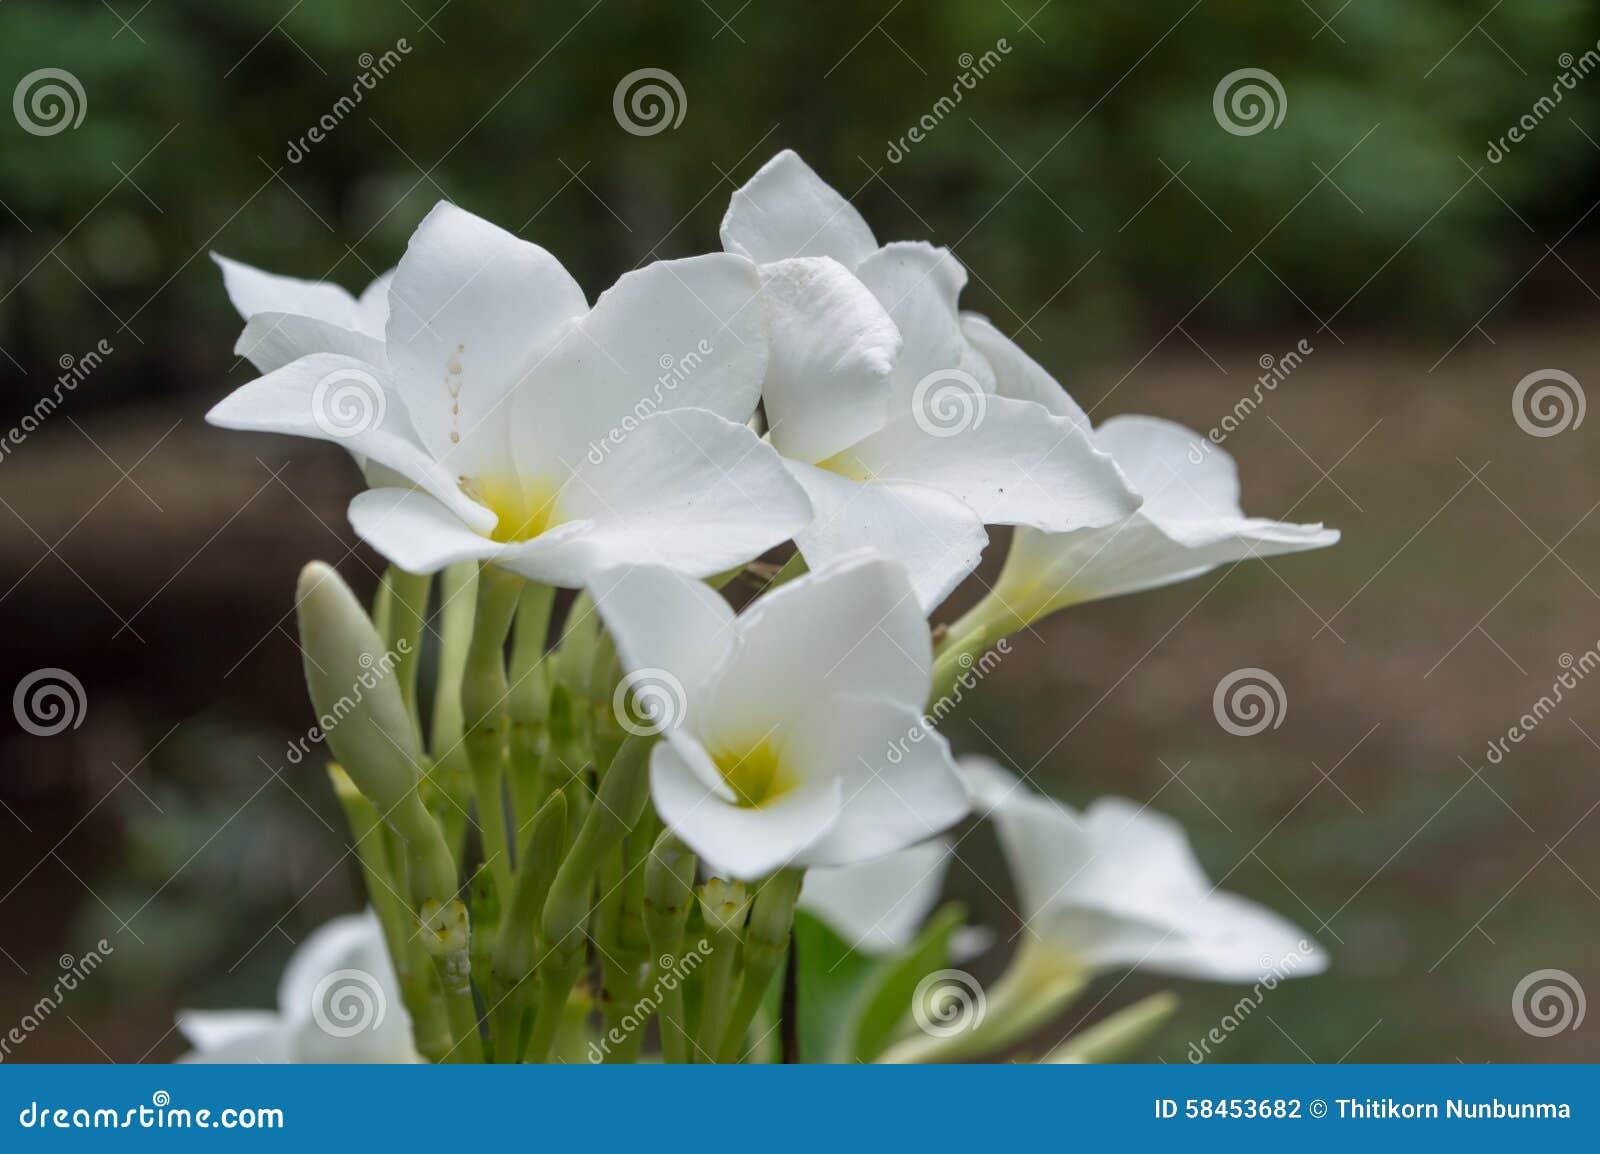 Azalea white flowers stock photo image of bloom aroma 58453682 azalea flower white middle yellow green leaves mightylinksfo